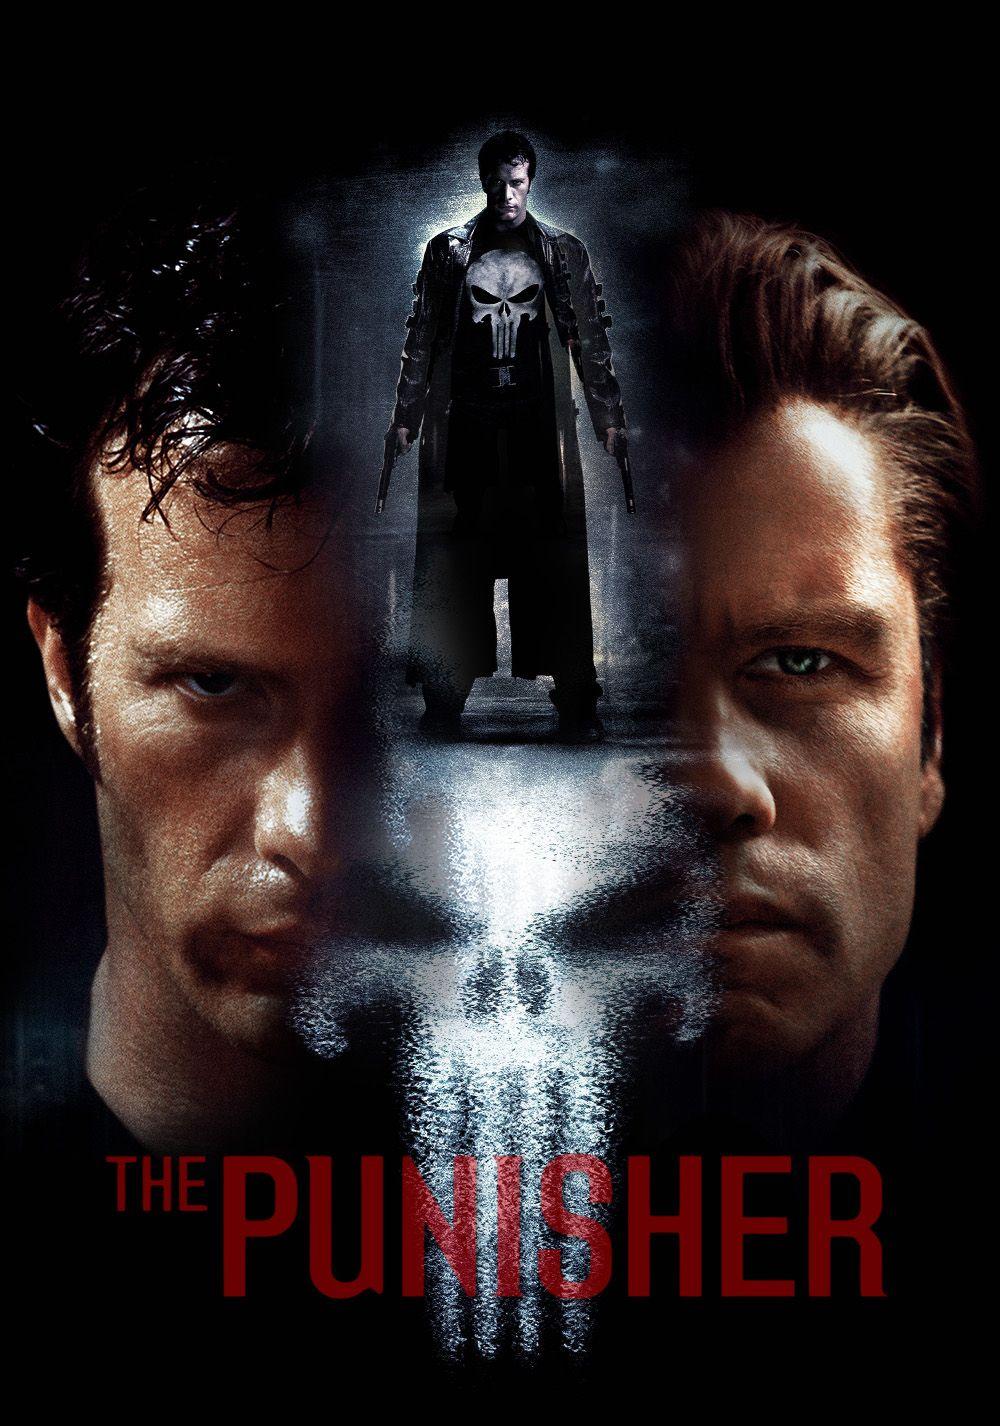 The Punisher 1 -El castigador (2004)